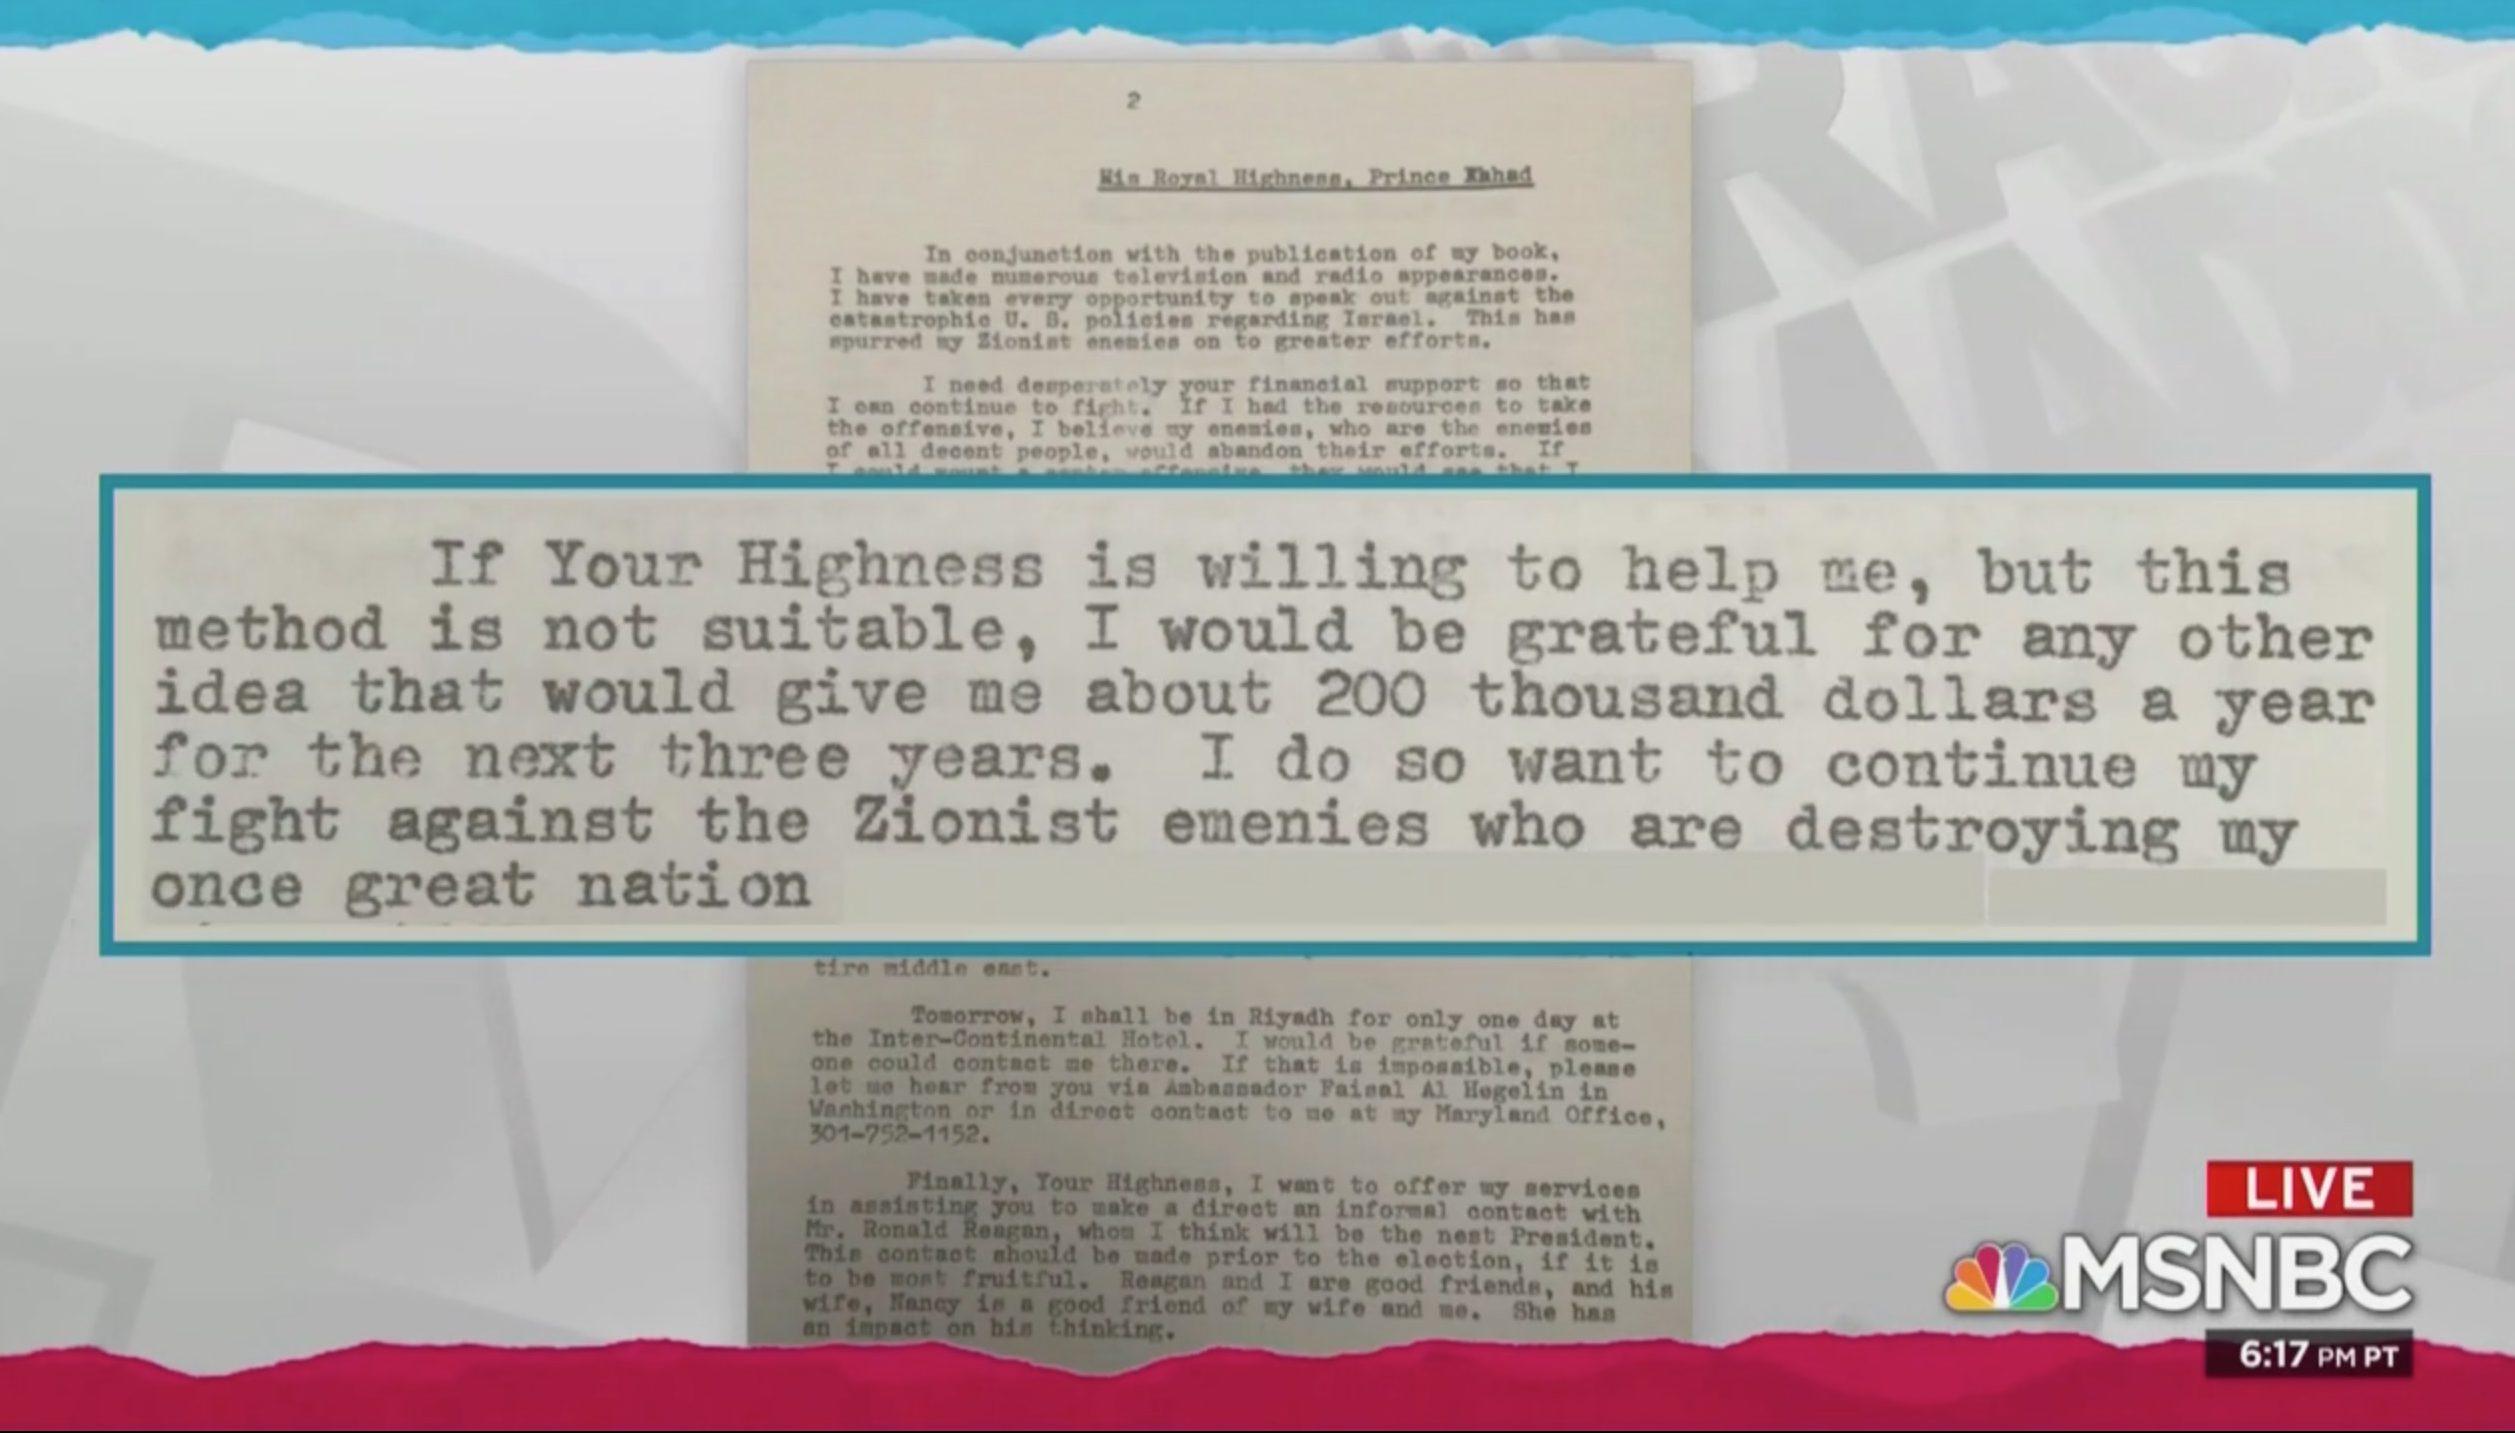 Stunning Maddow Report Details How Nixon VP Spiro Agnew Took